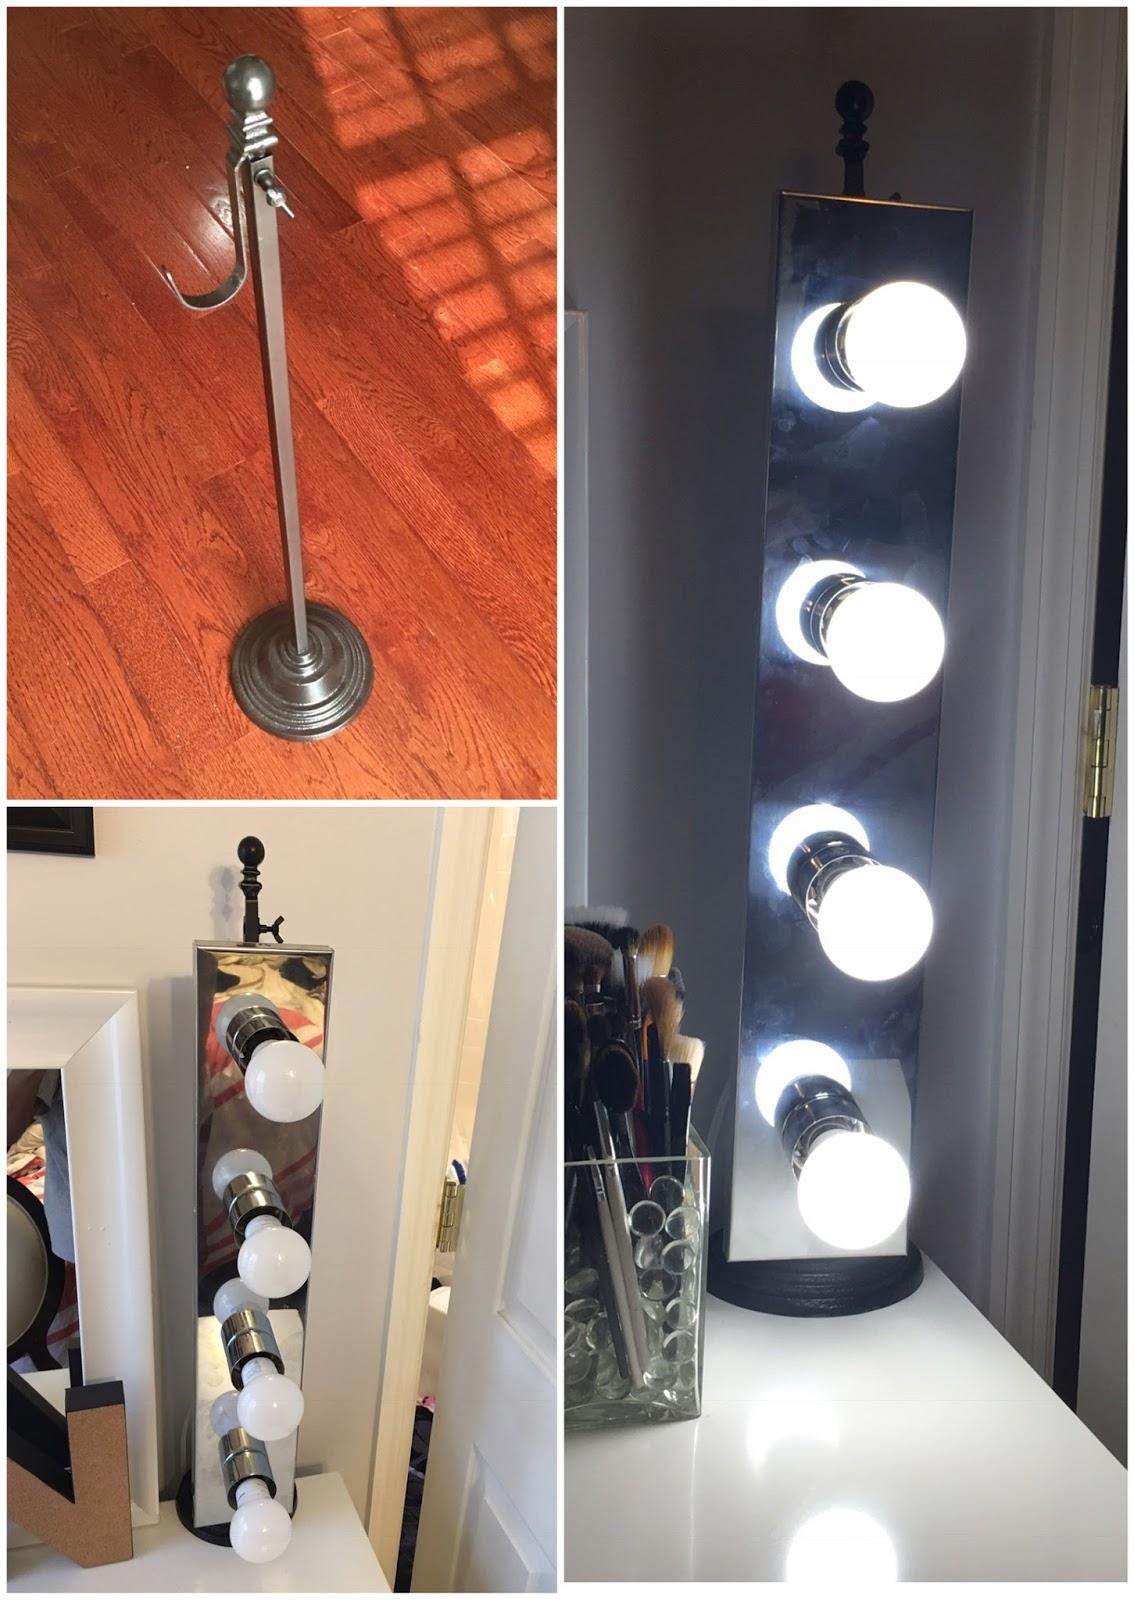 DIY Freestanding Vanity Lighting | DIY Projects By Nina